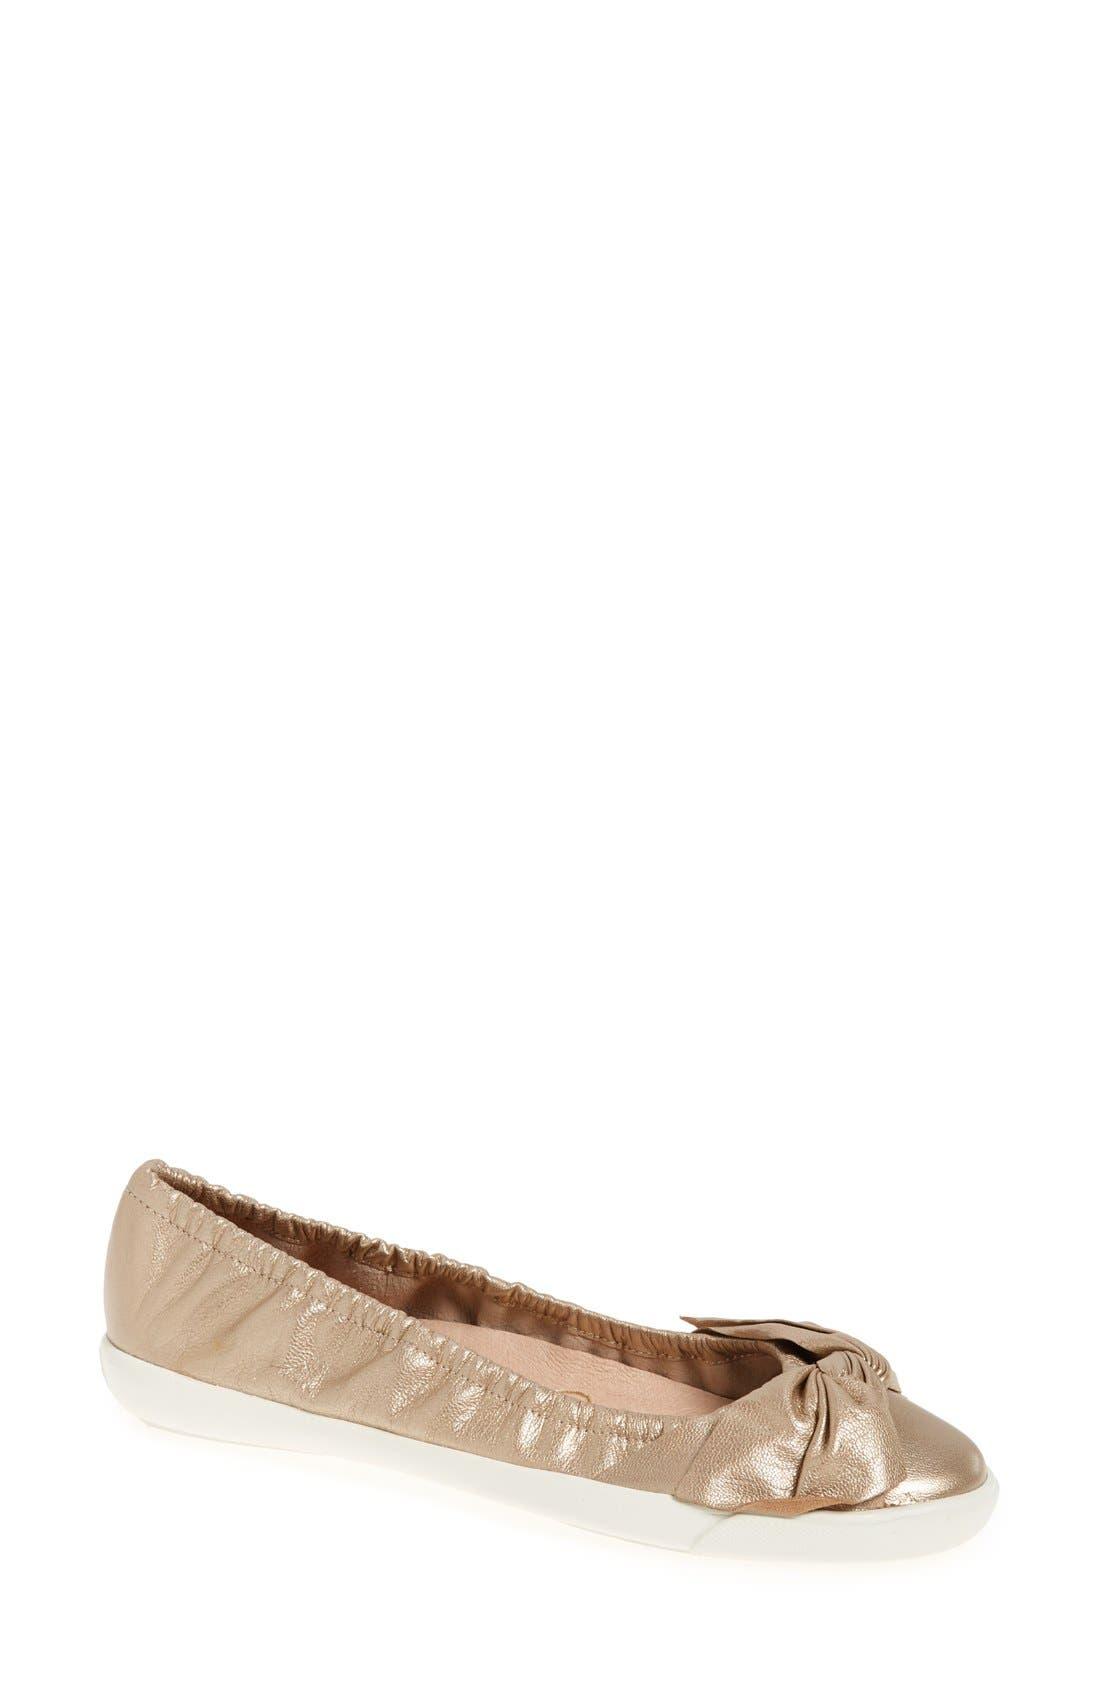 Sudini 'Olga' Leather Flat (Women)